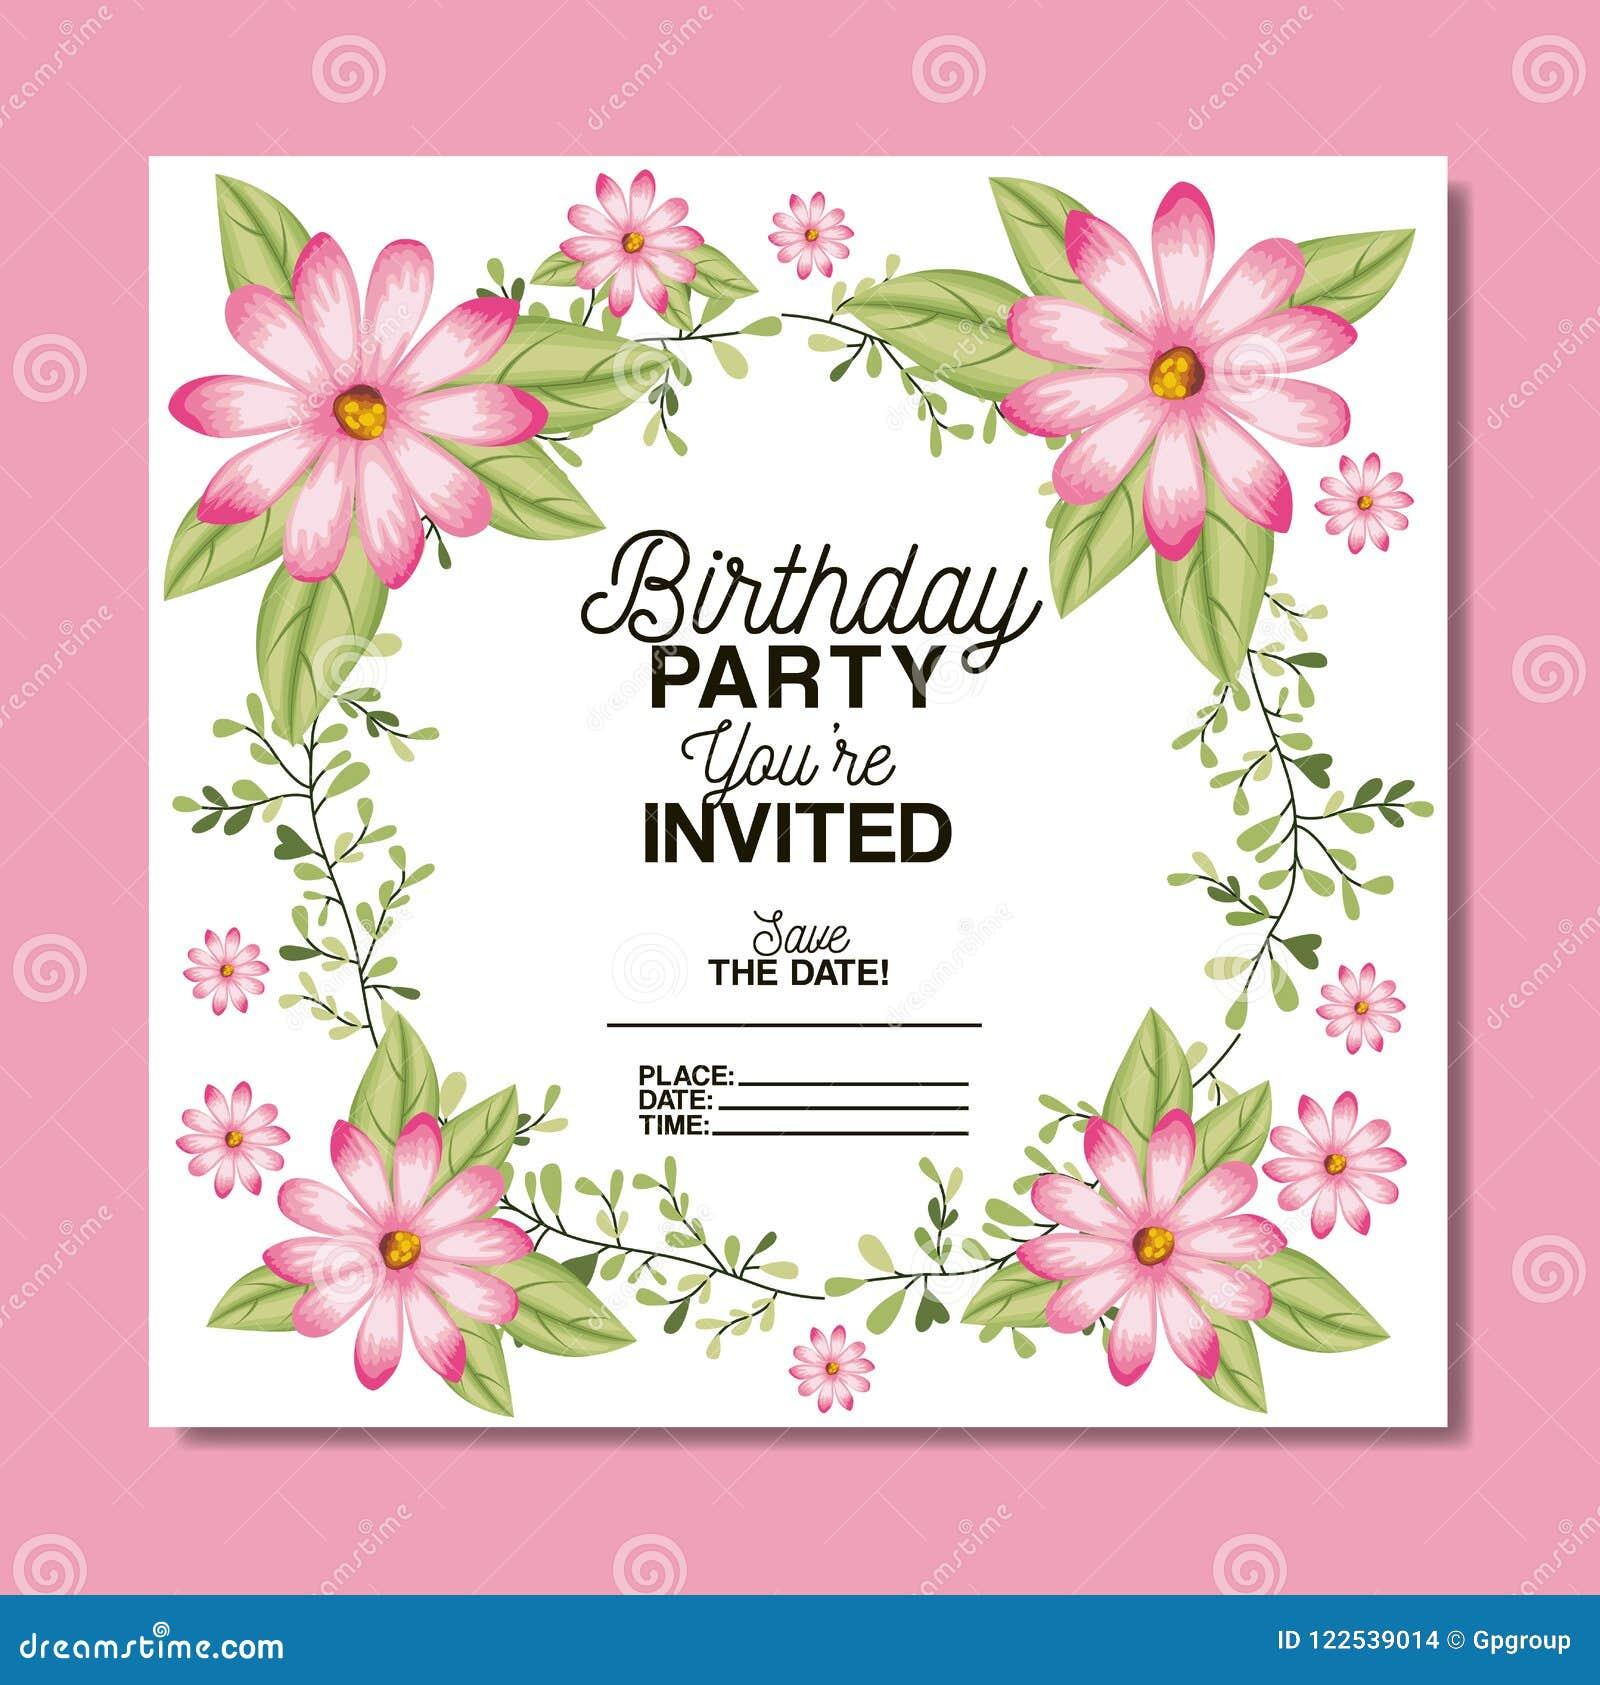 Birthday party invitation with floral decoration stock vector birthday party invitation with floral decoration izmirmasajfo